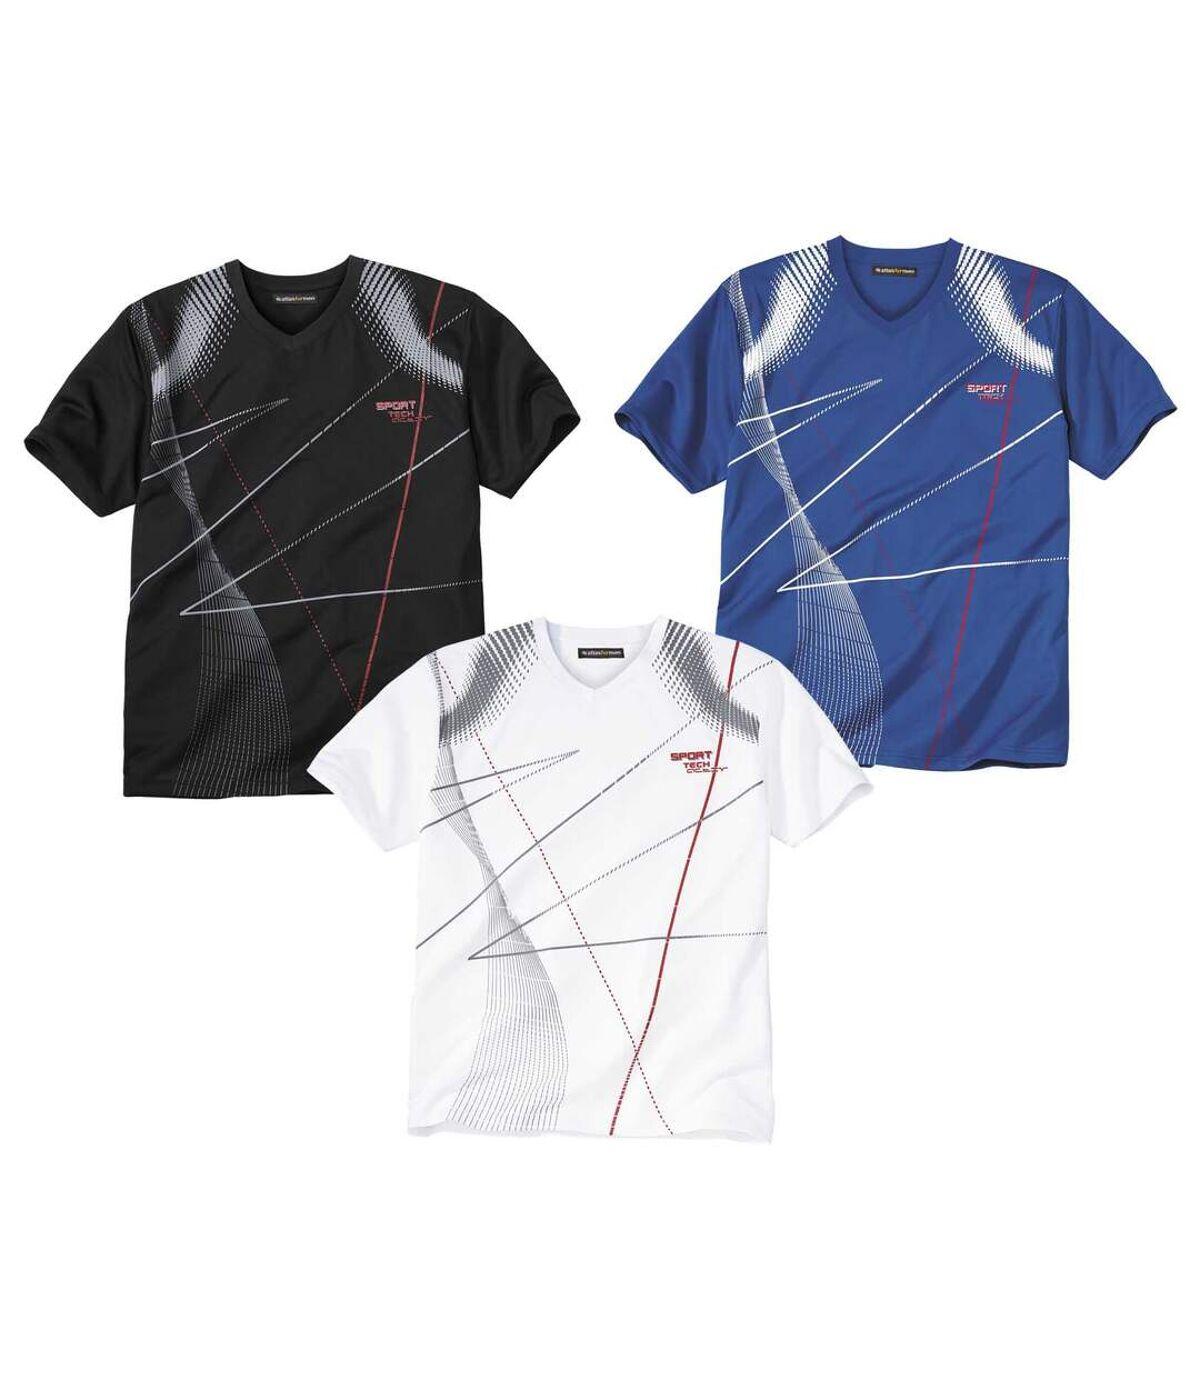 Pack of 3 Men's Cotton T-Shirts - Black White Blue Atlas For Men